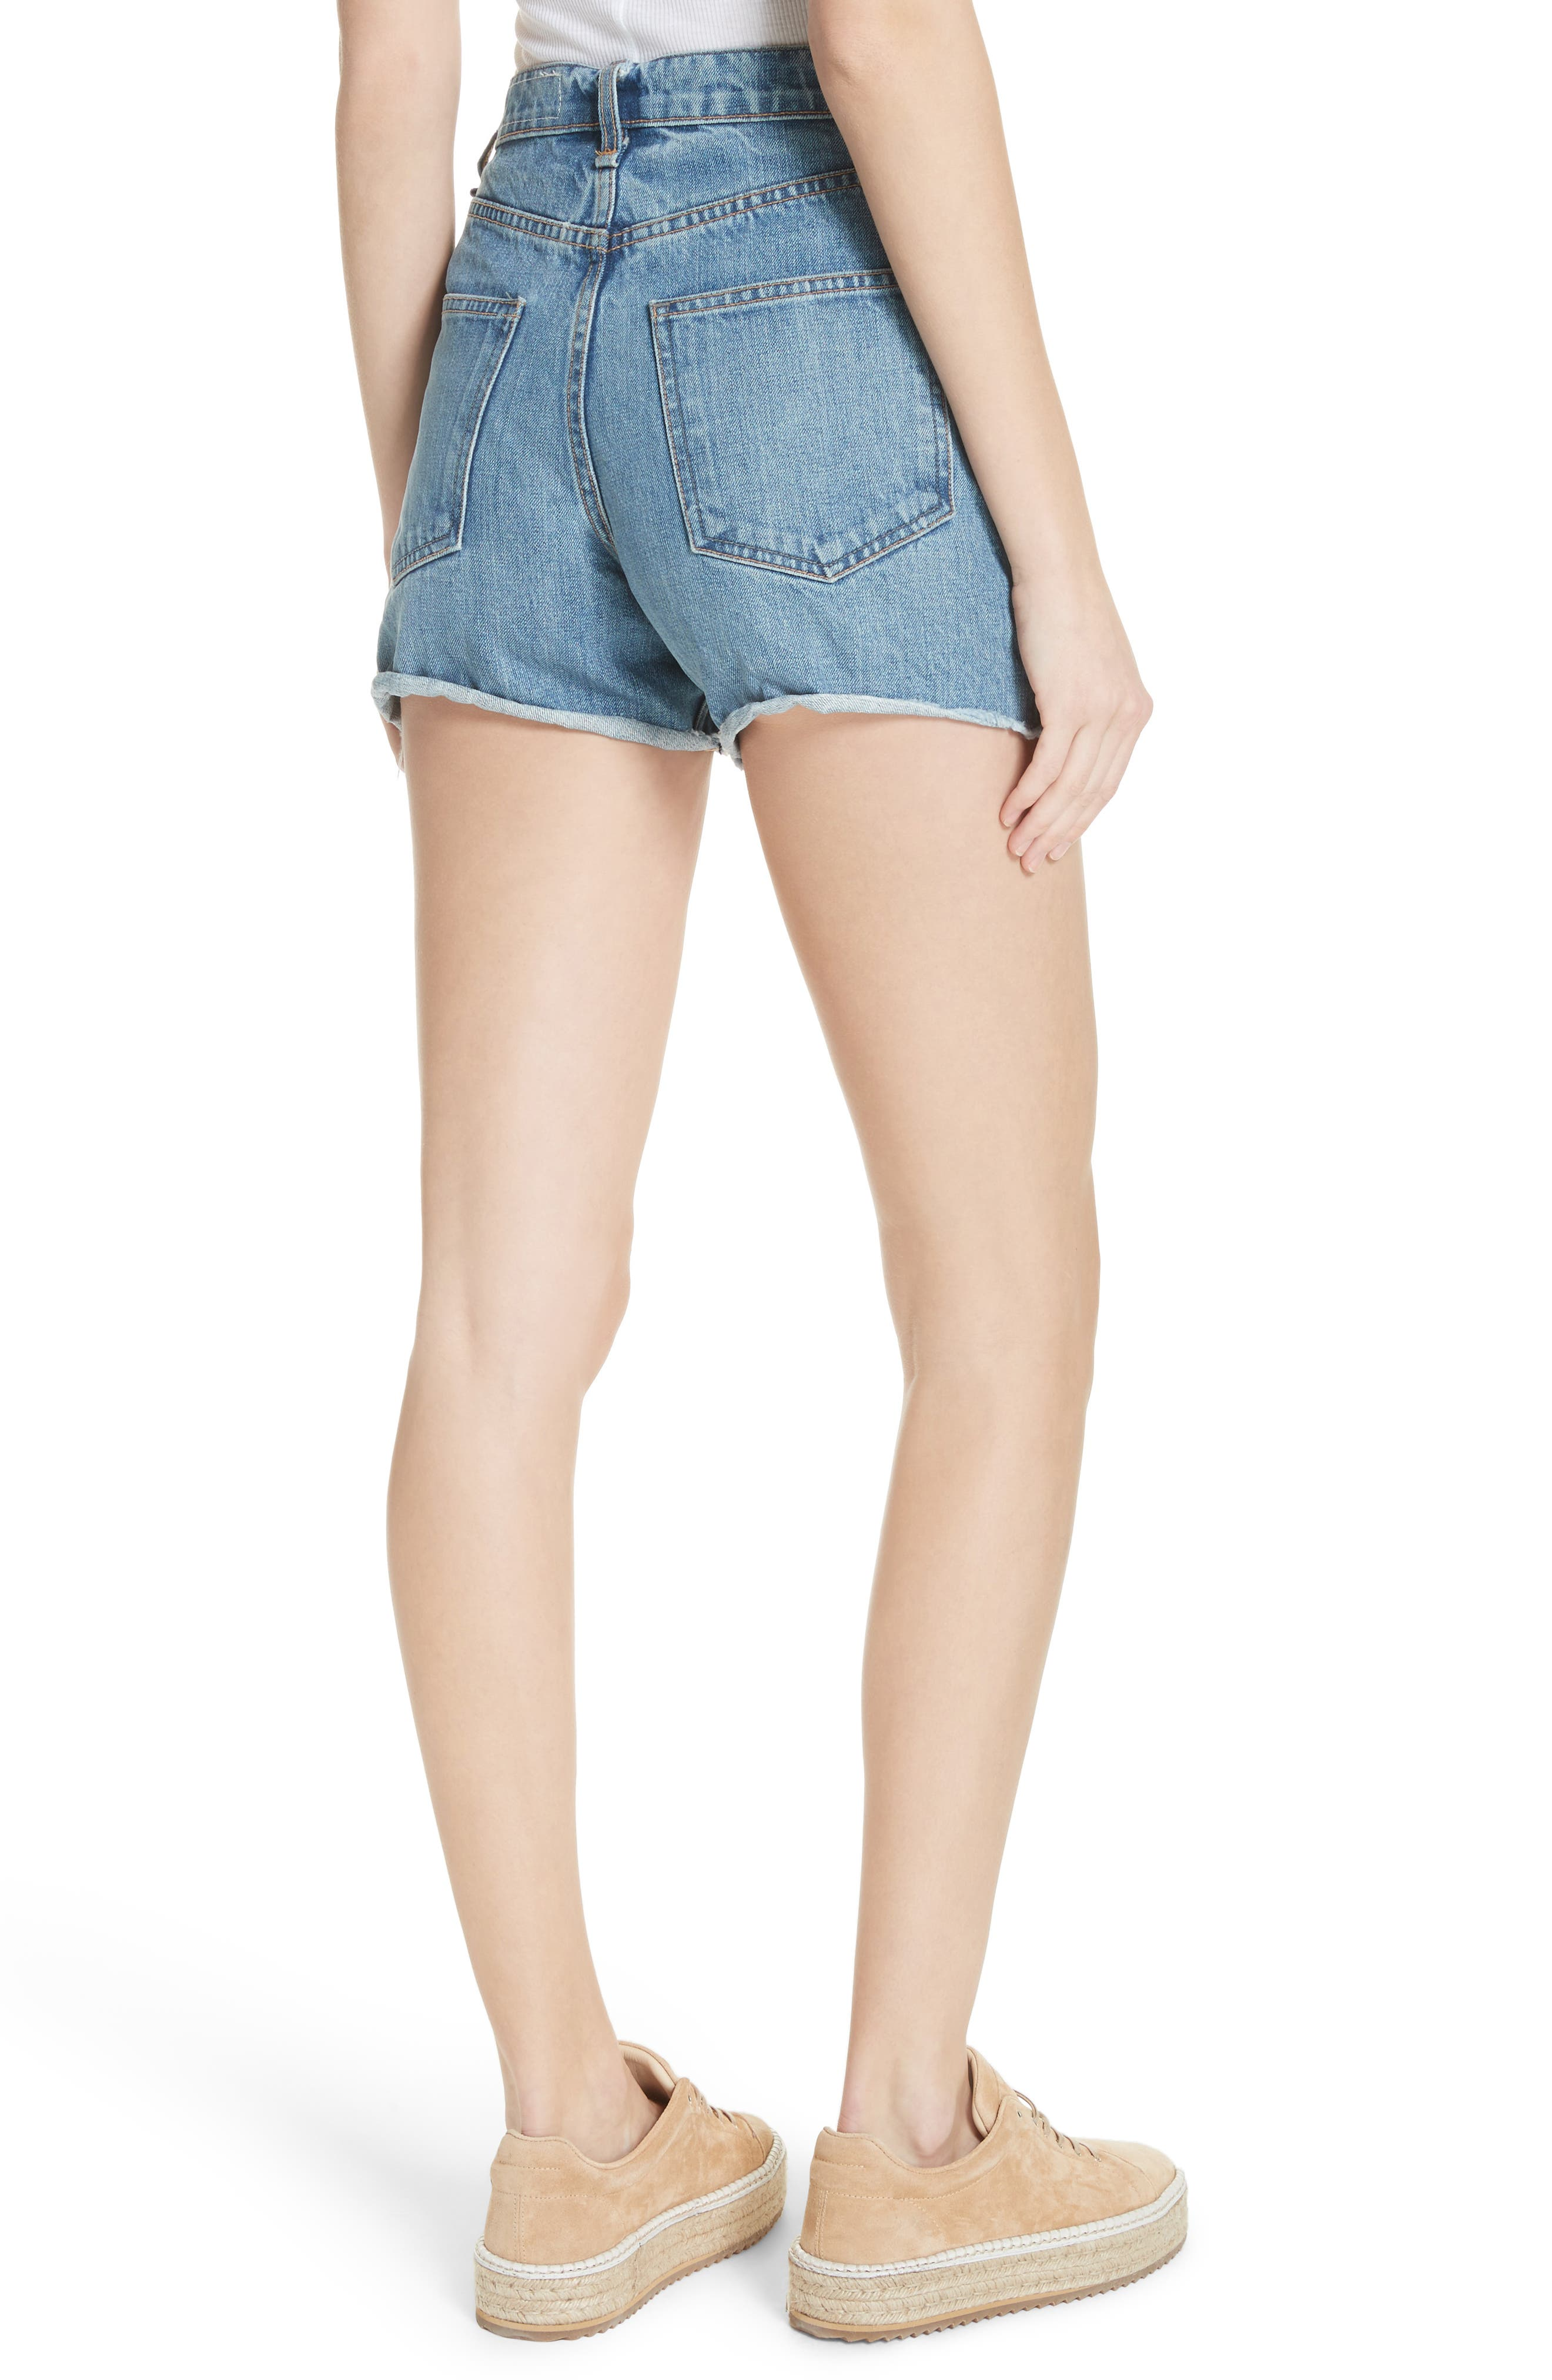 Torti High Waist Denim Shorts,                             Alternate thumbnail 2, color,                             400